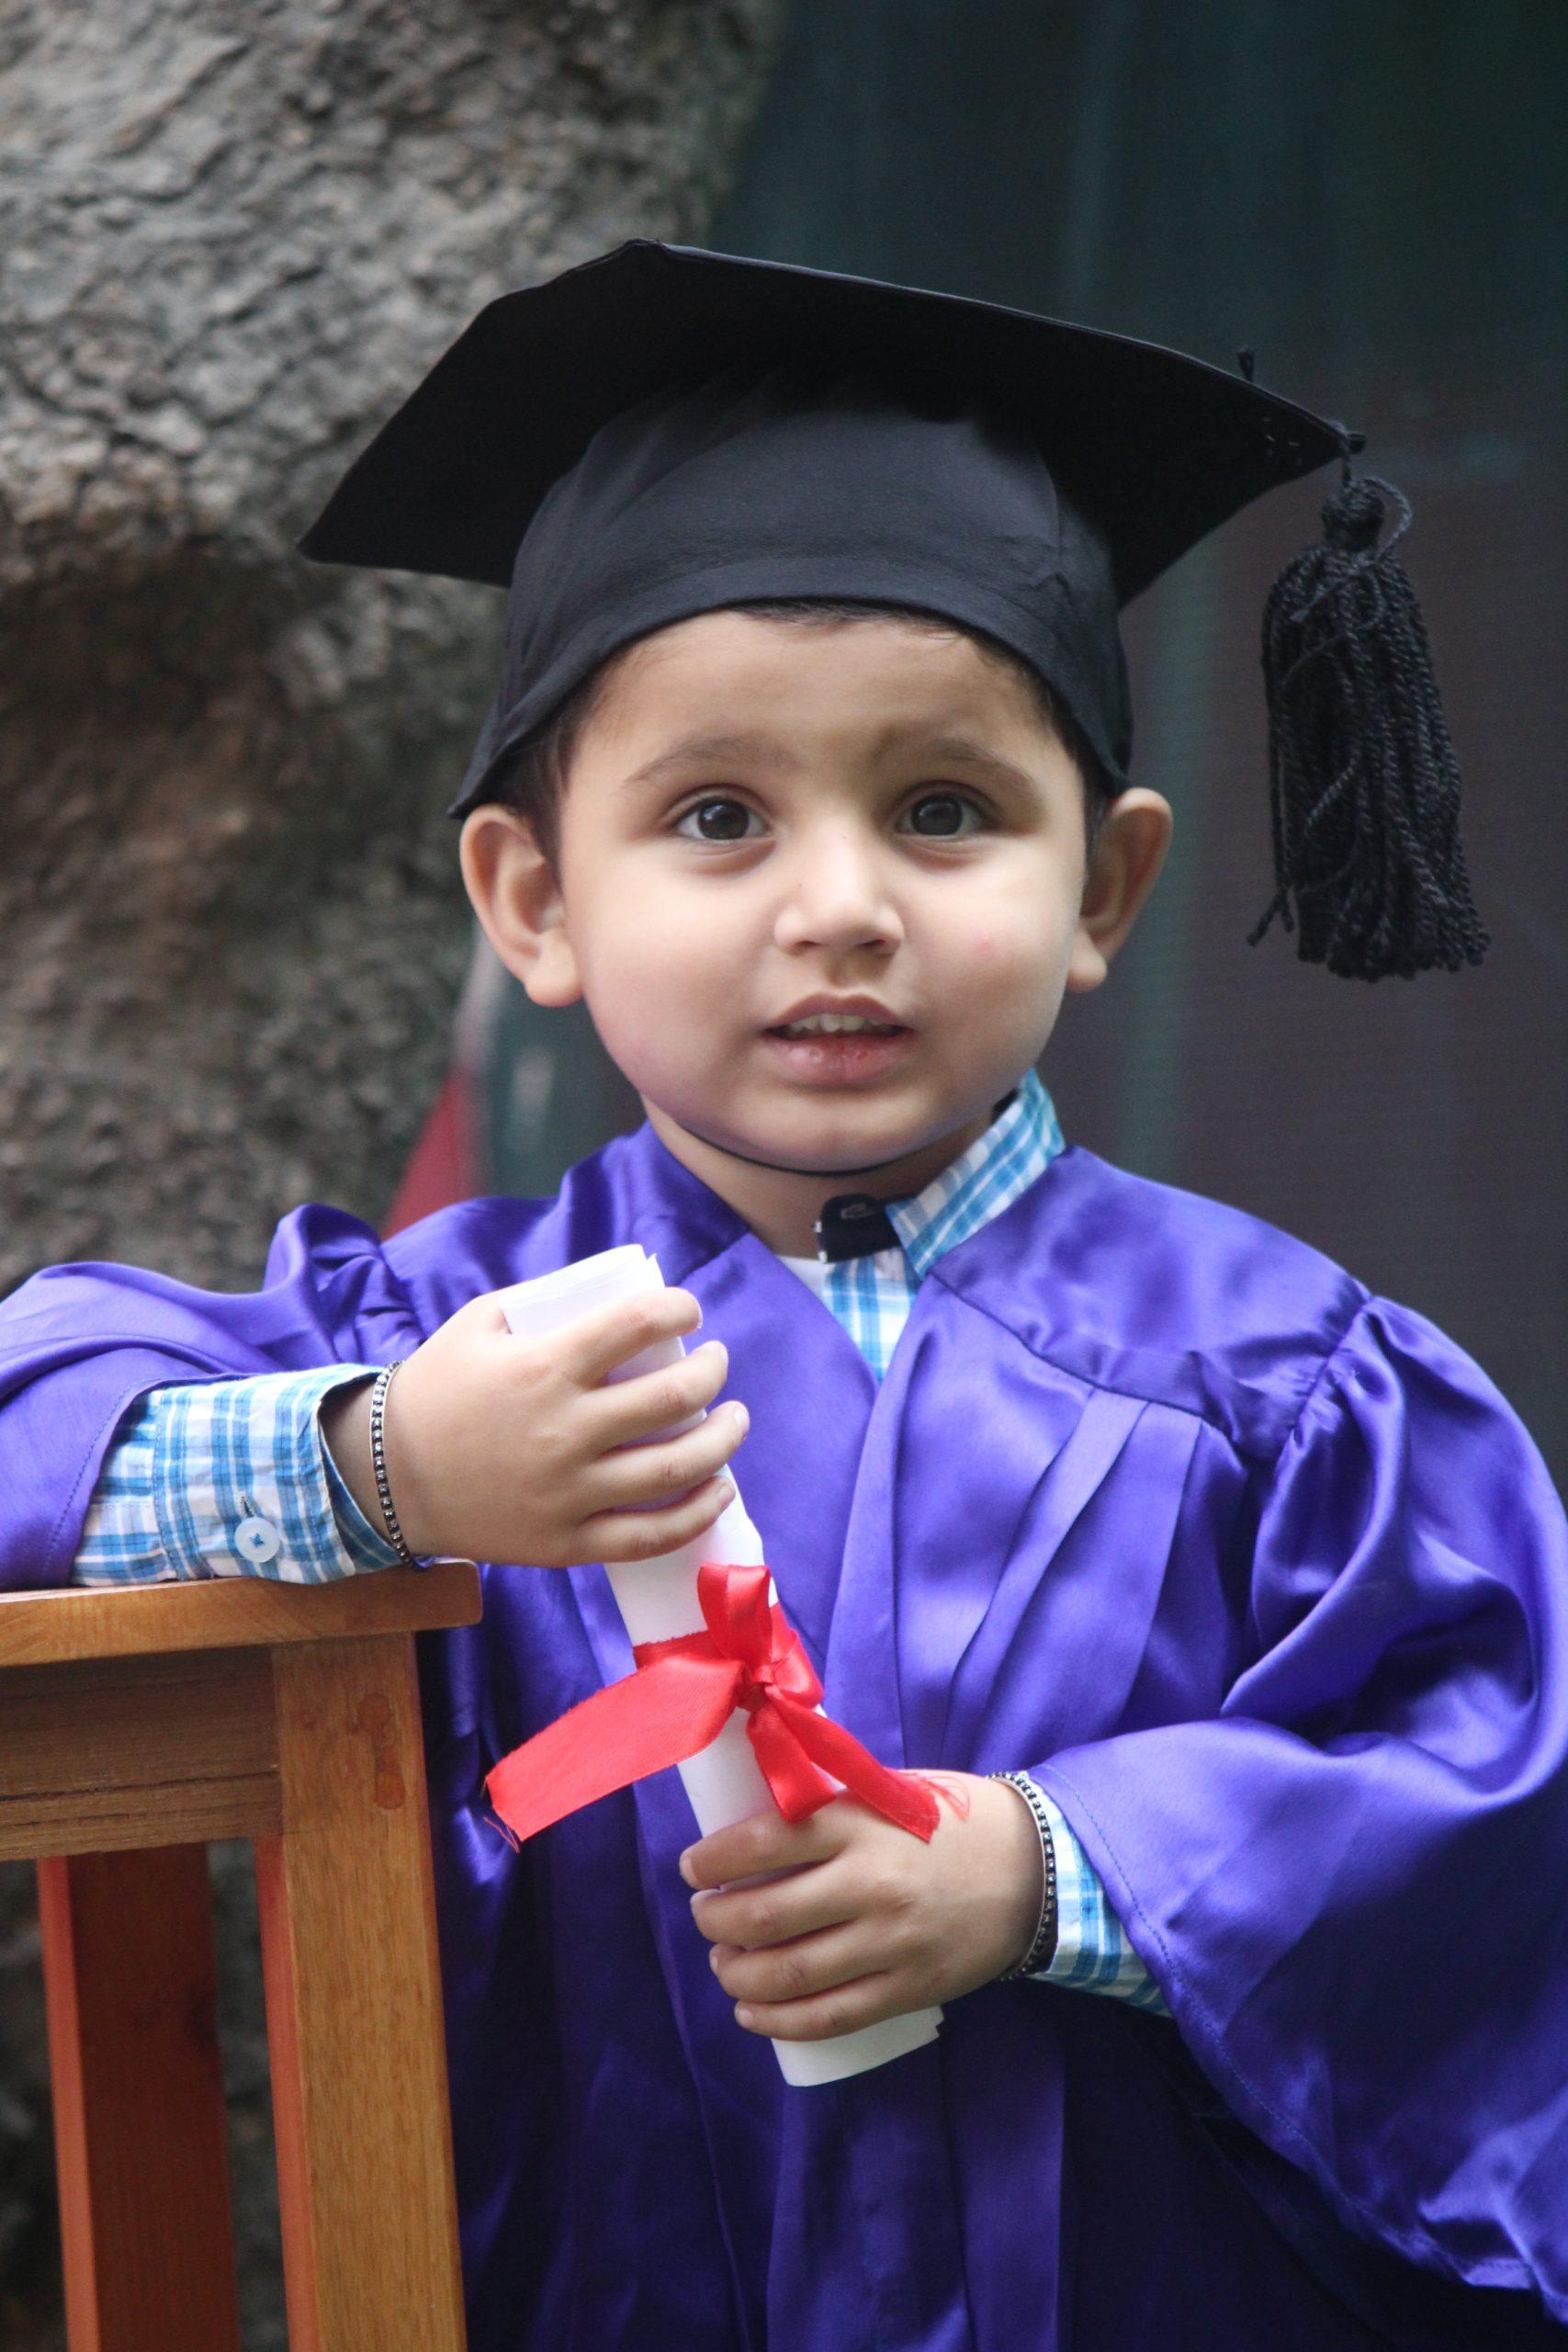 A kid wore graduation day dress